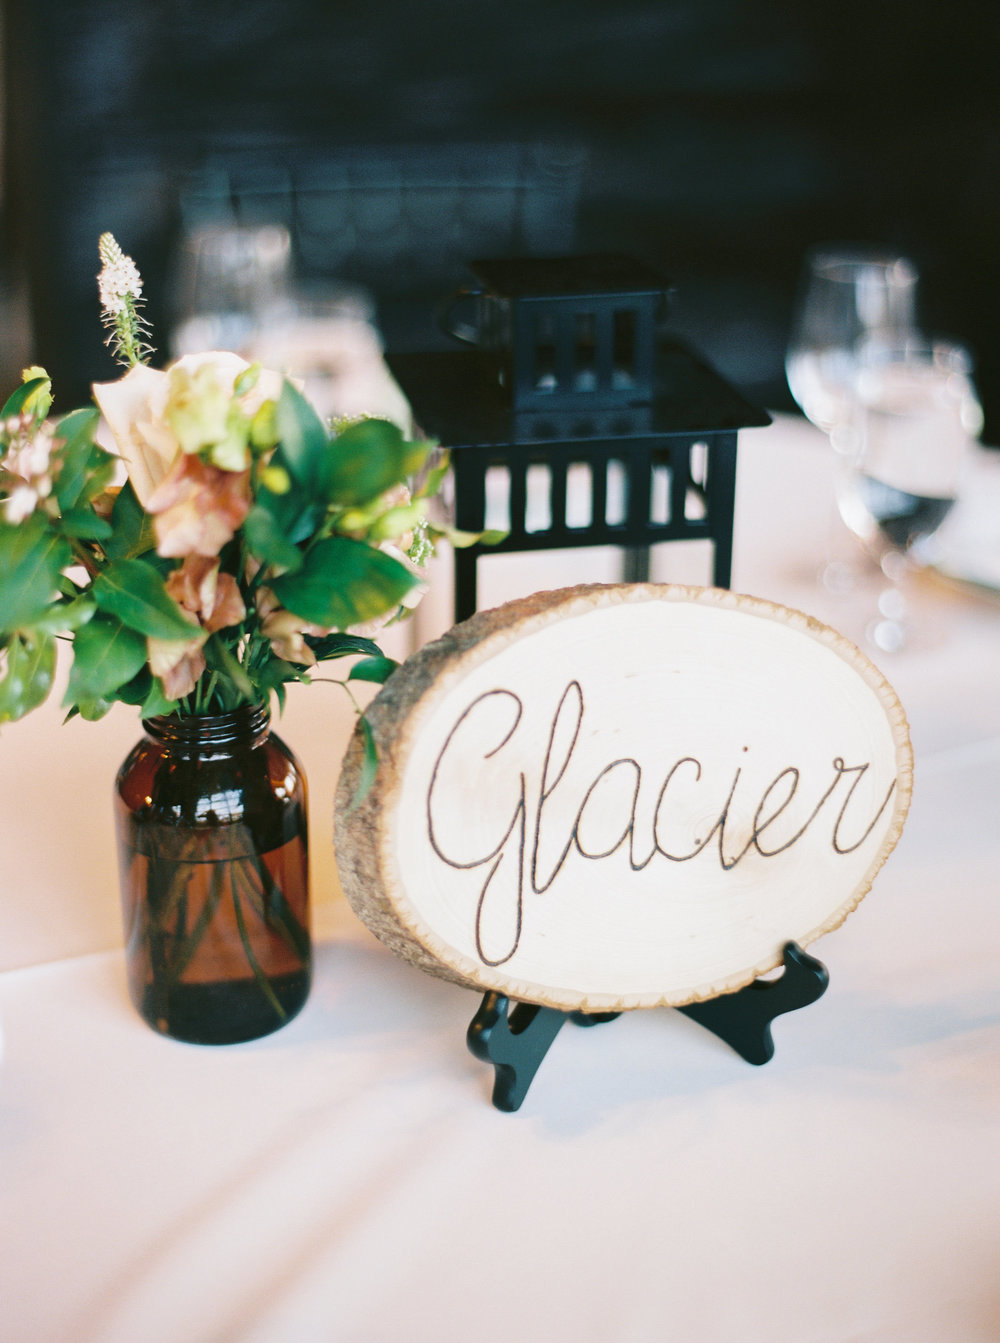 Log-cabin-wedding-in-presidio-san-francisco-california-desintation-wedding-photography-134.jpg